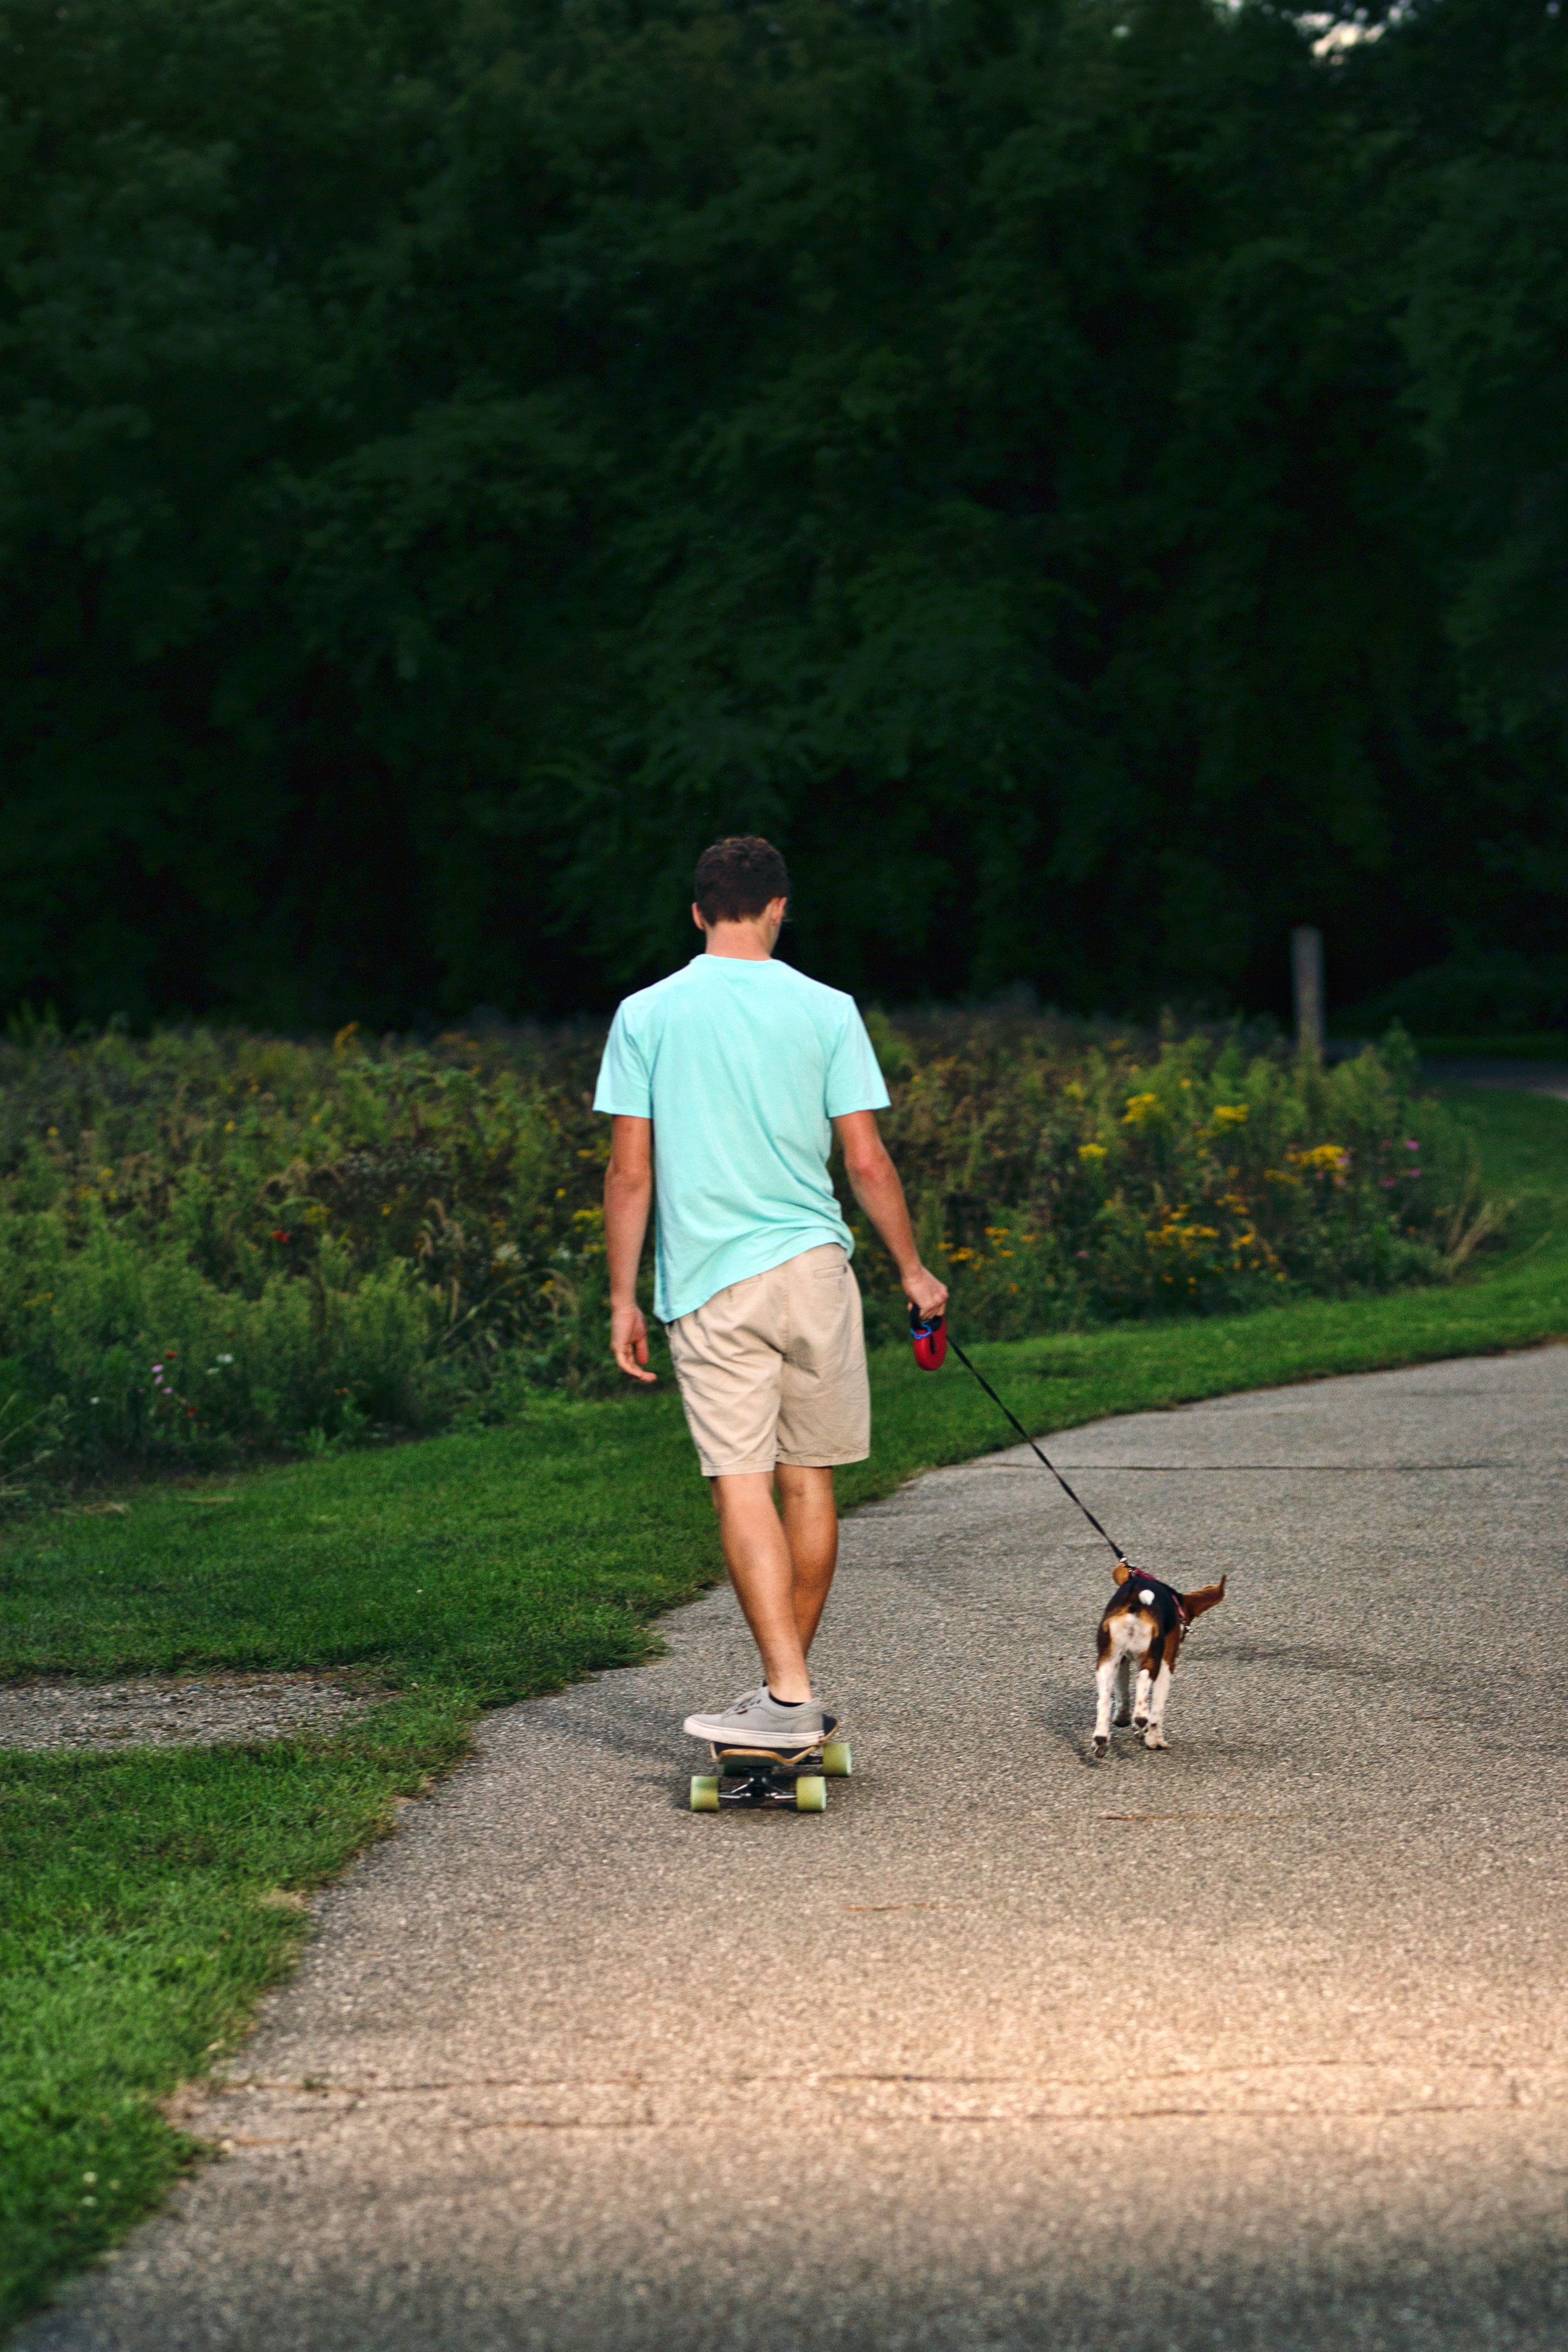 boy skateboarding with dog